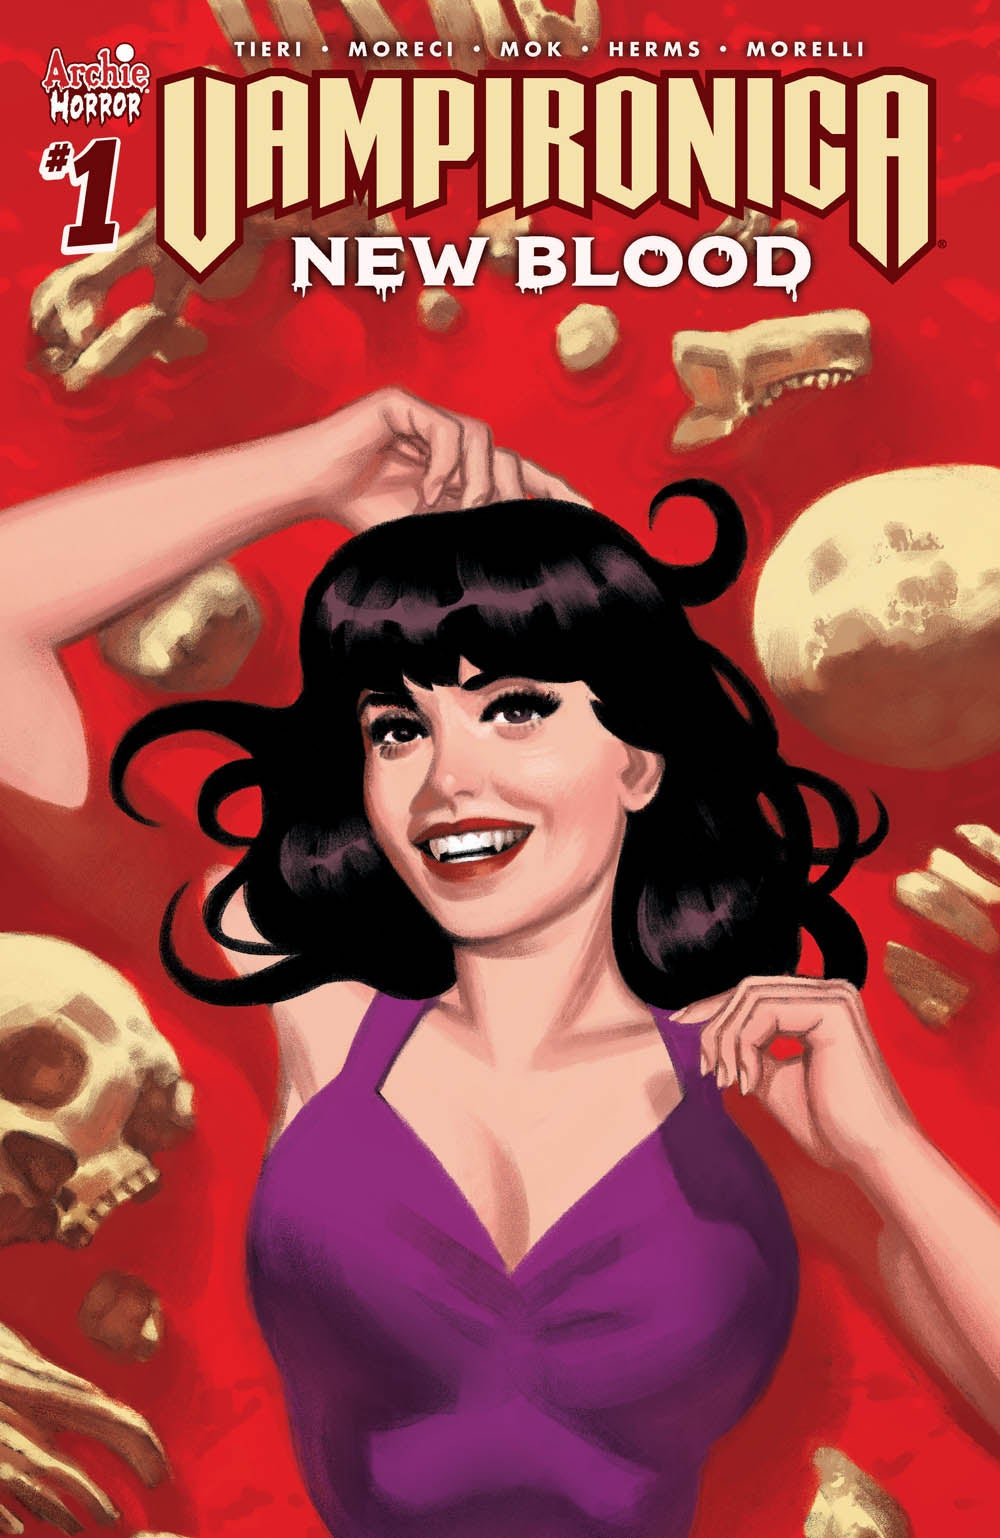 Image: Greg Smallwood, Archie Comics